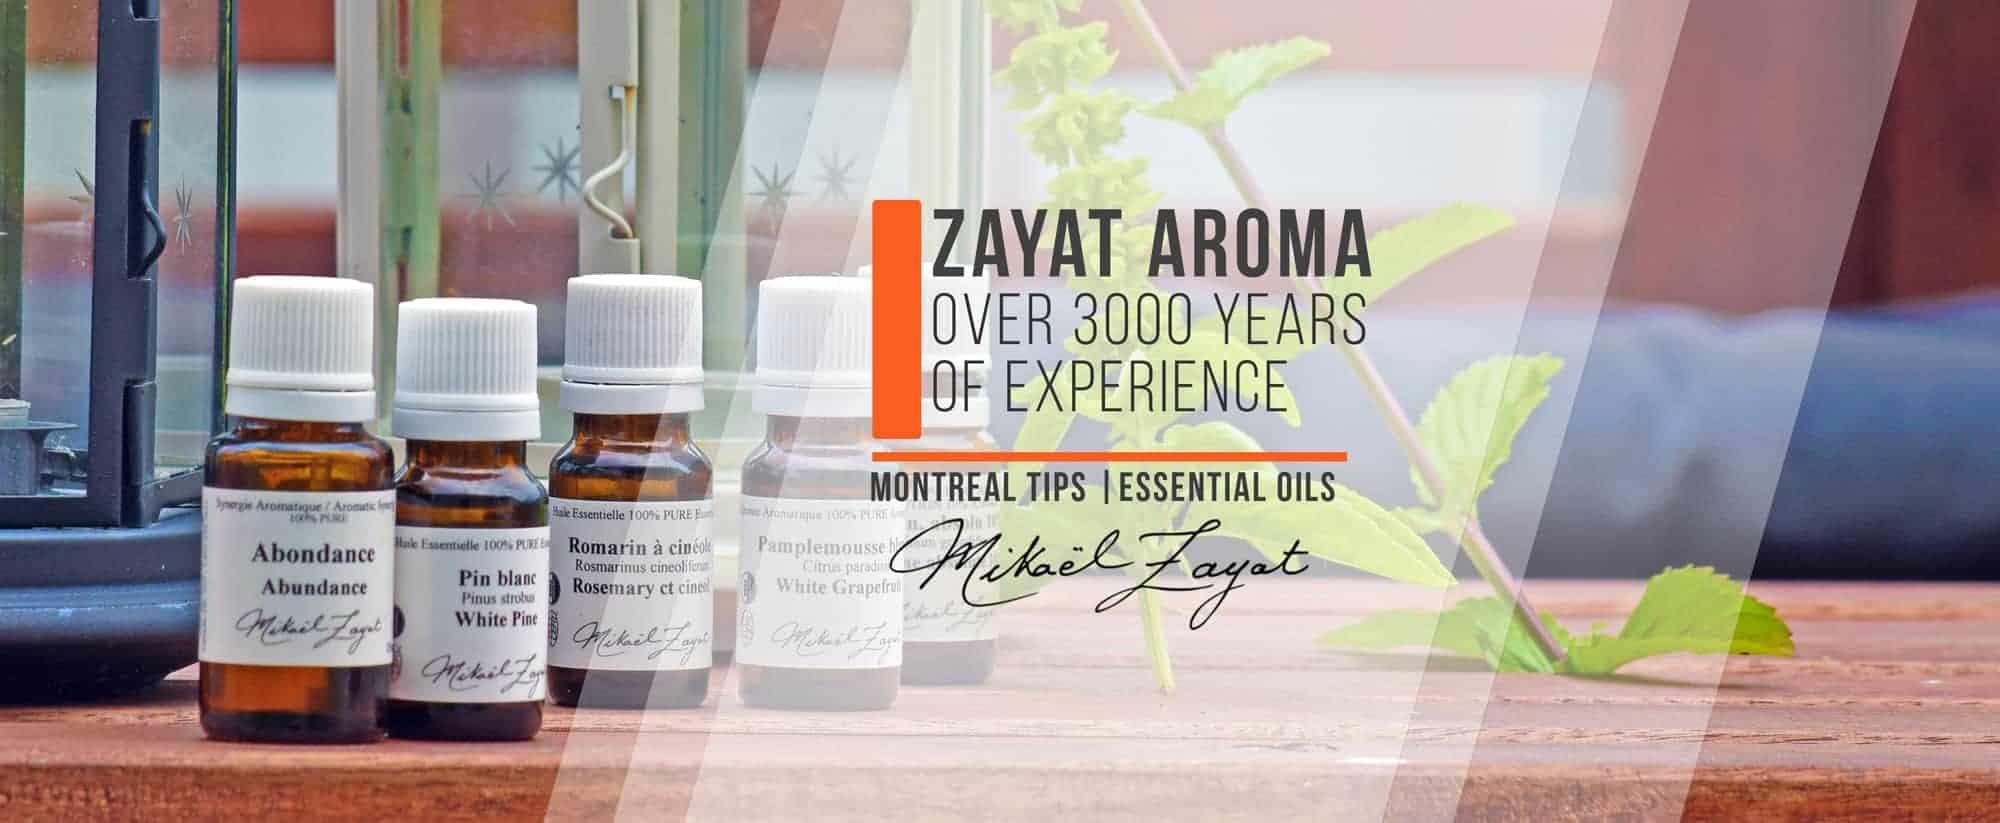 Zayat Aroma - Essential Oil